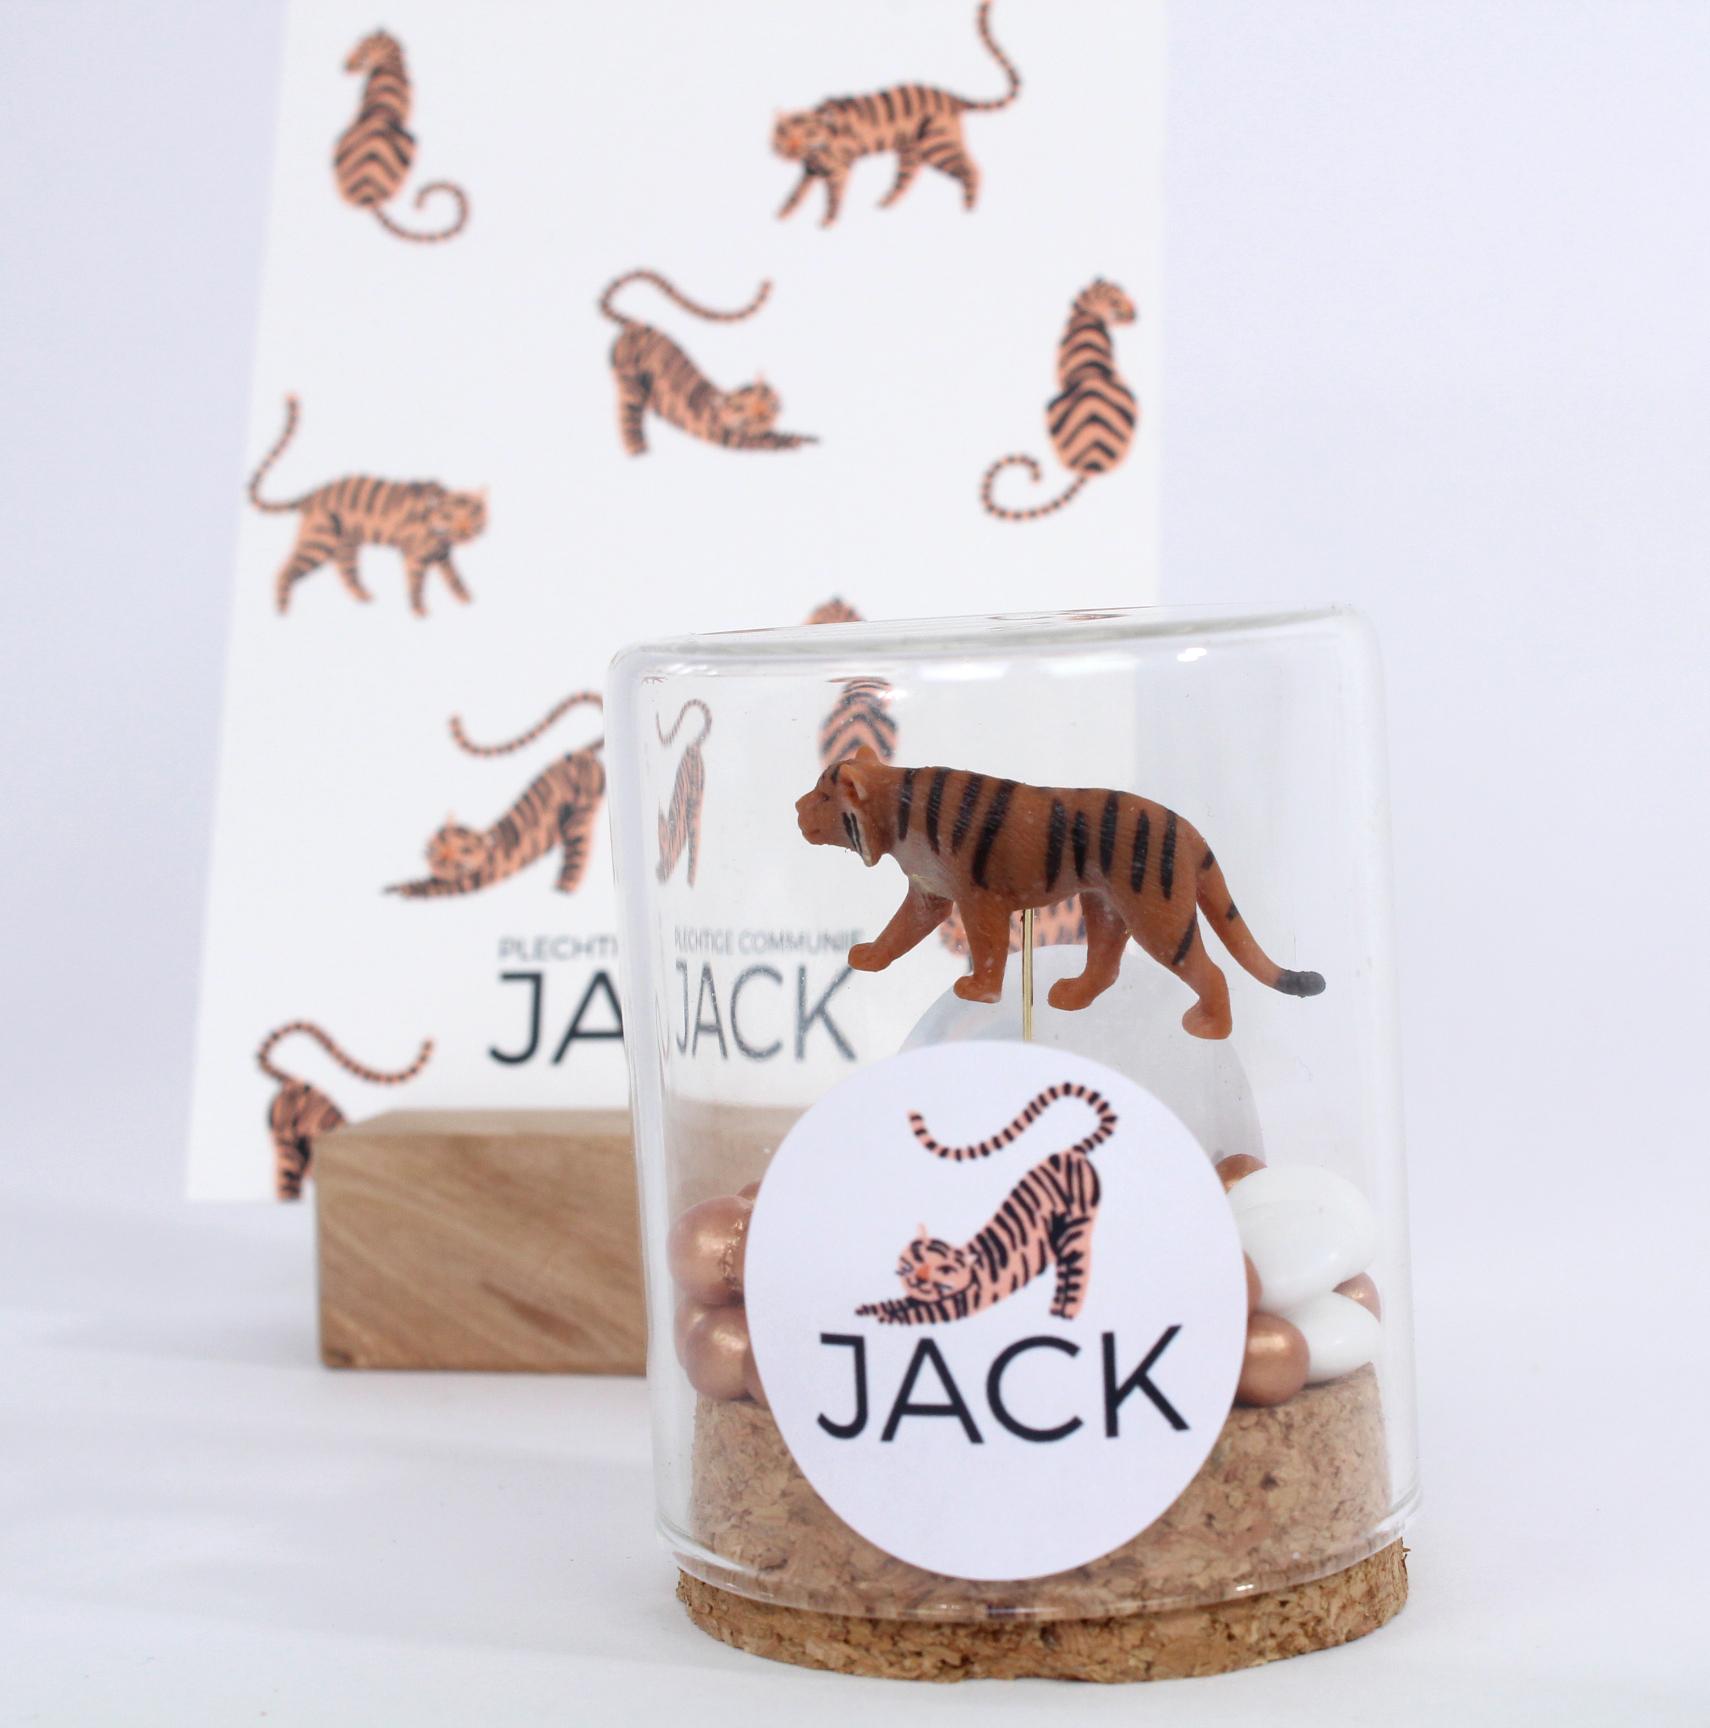 JACK 3.jpg